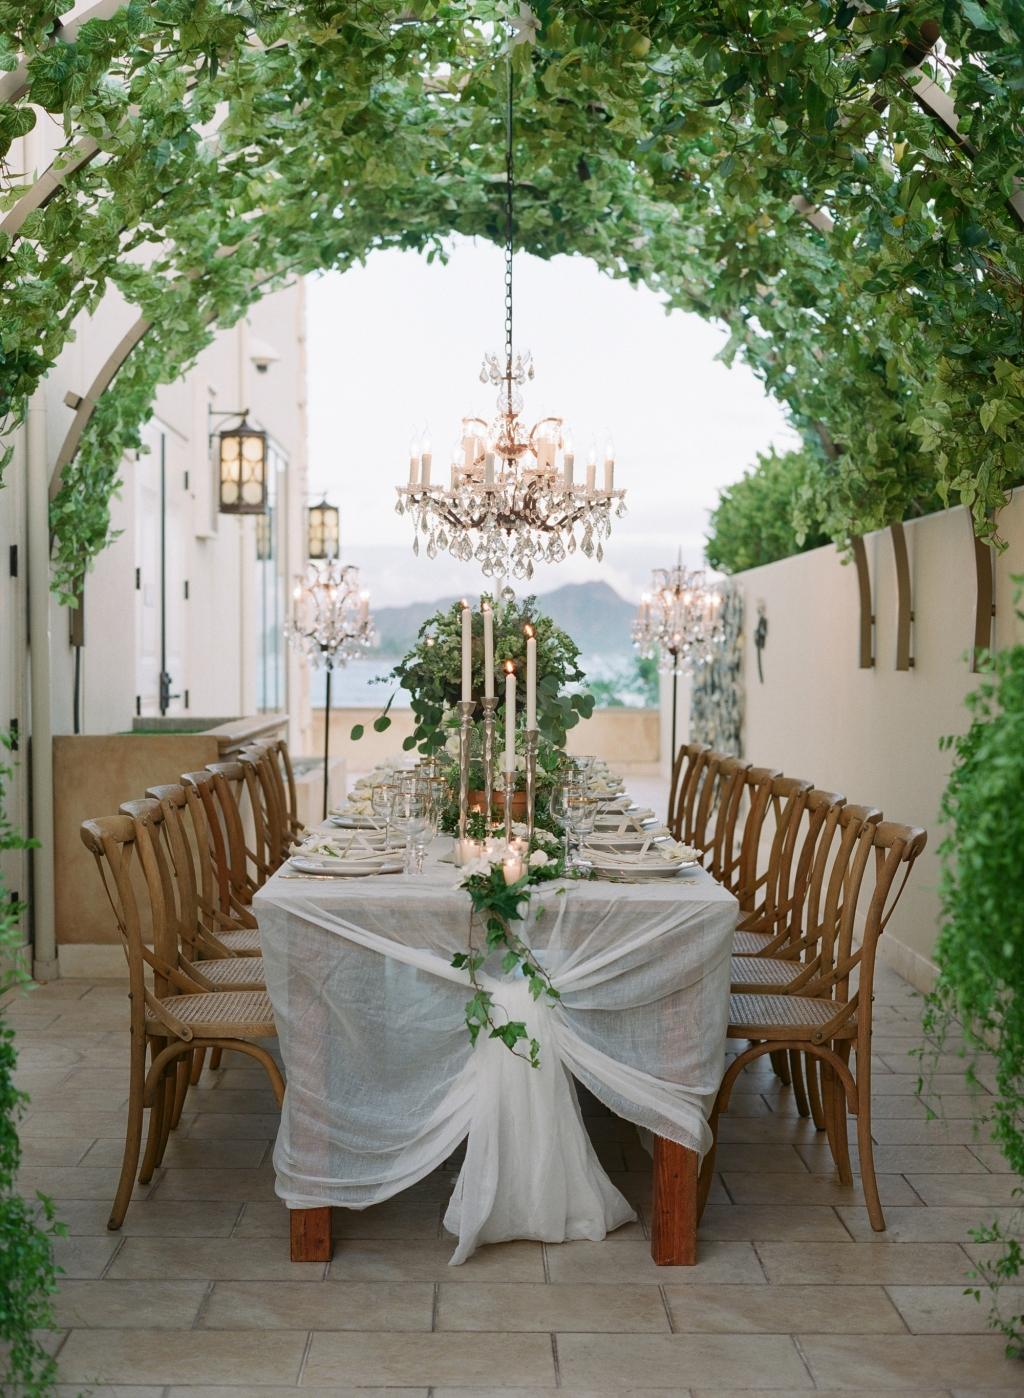 The Most Beautiful Hawaii Wedding Venues in 2017